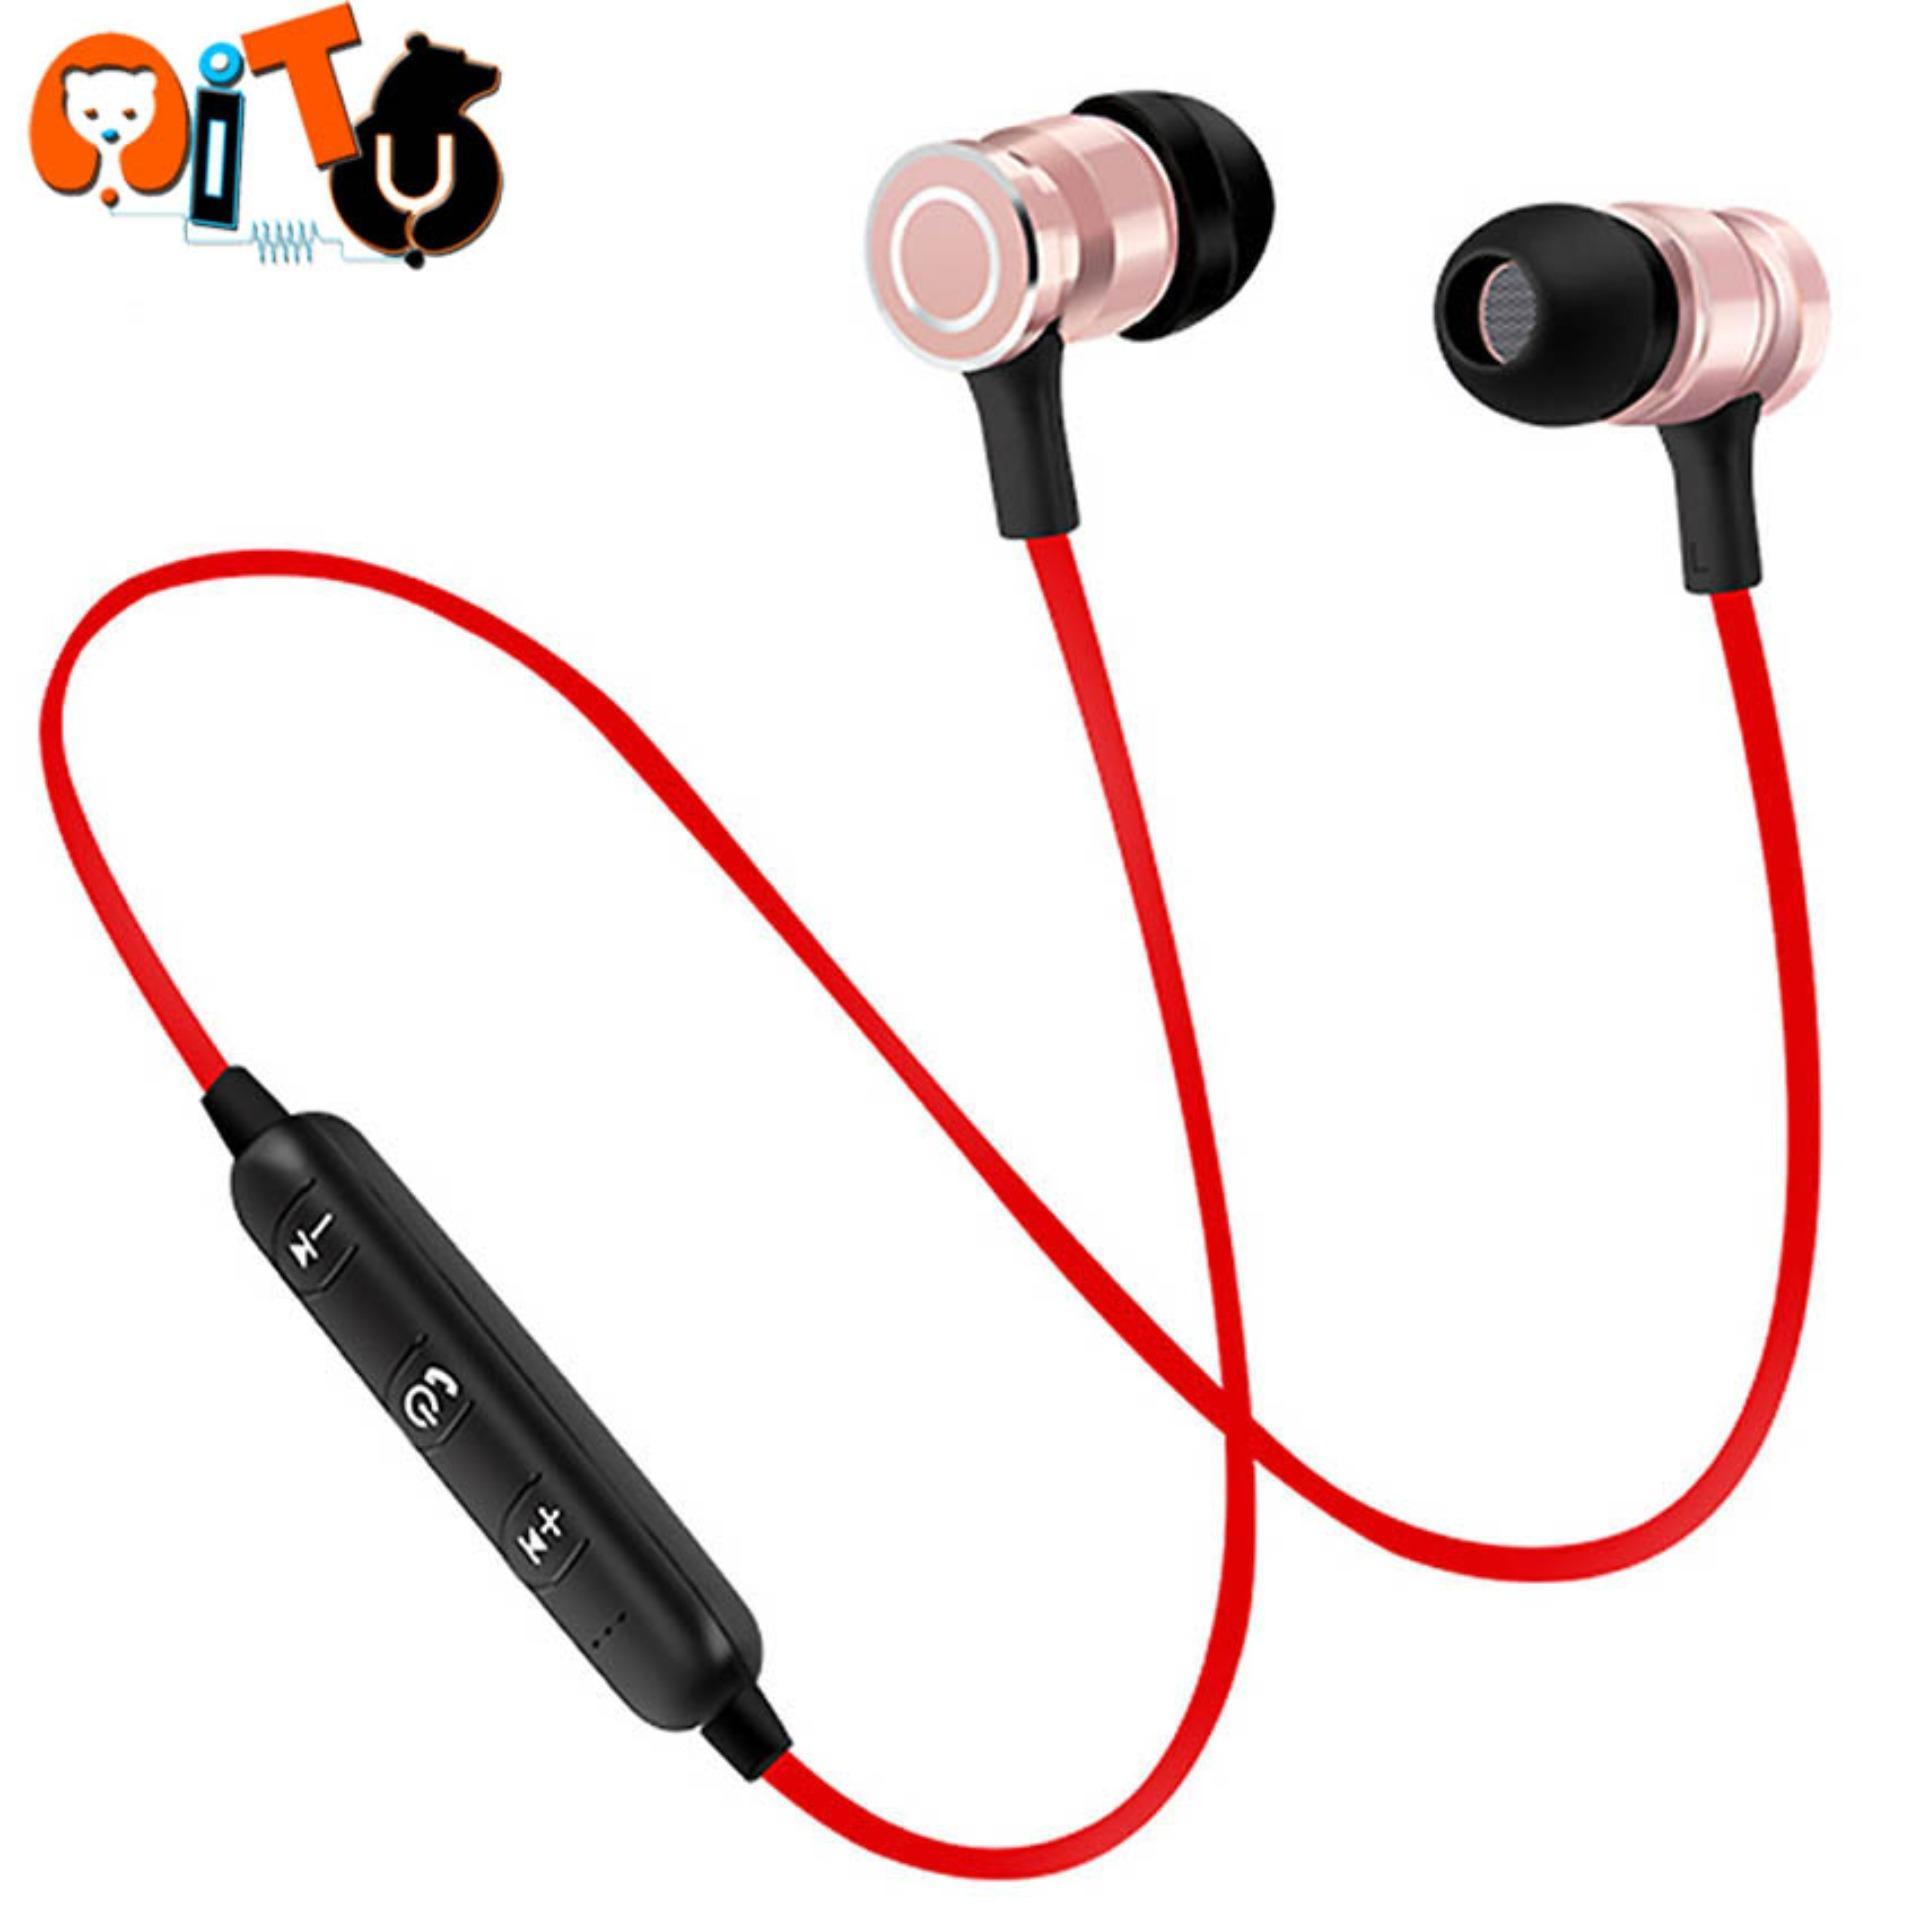 Headphones For Sale Bluetooth Prices Brands Specs In Handsfree Original Vivo S6 V2 Wireless Headset Sweat Proof Earphone With Microphone